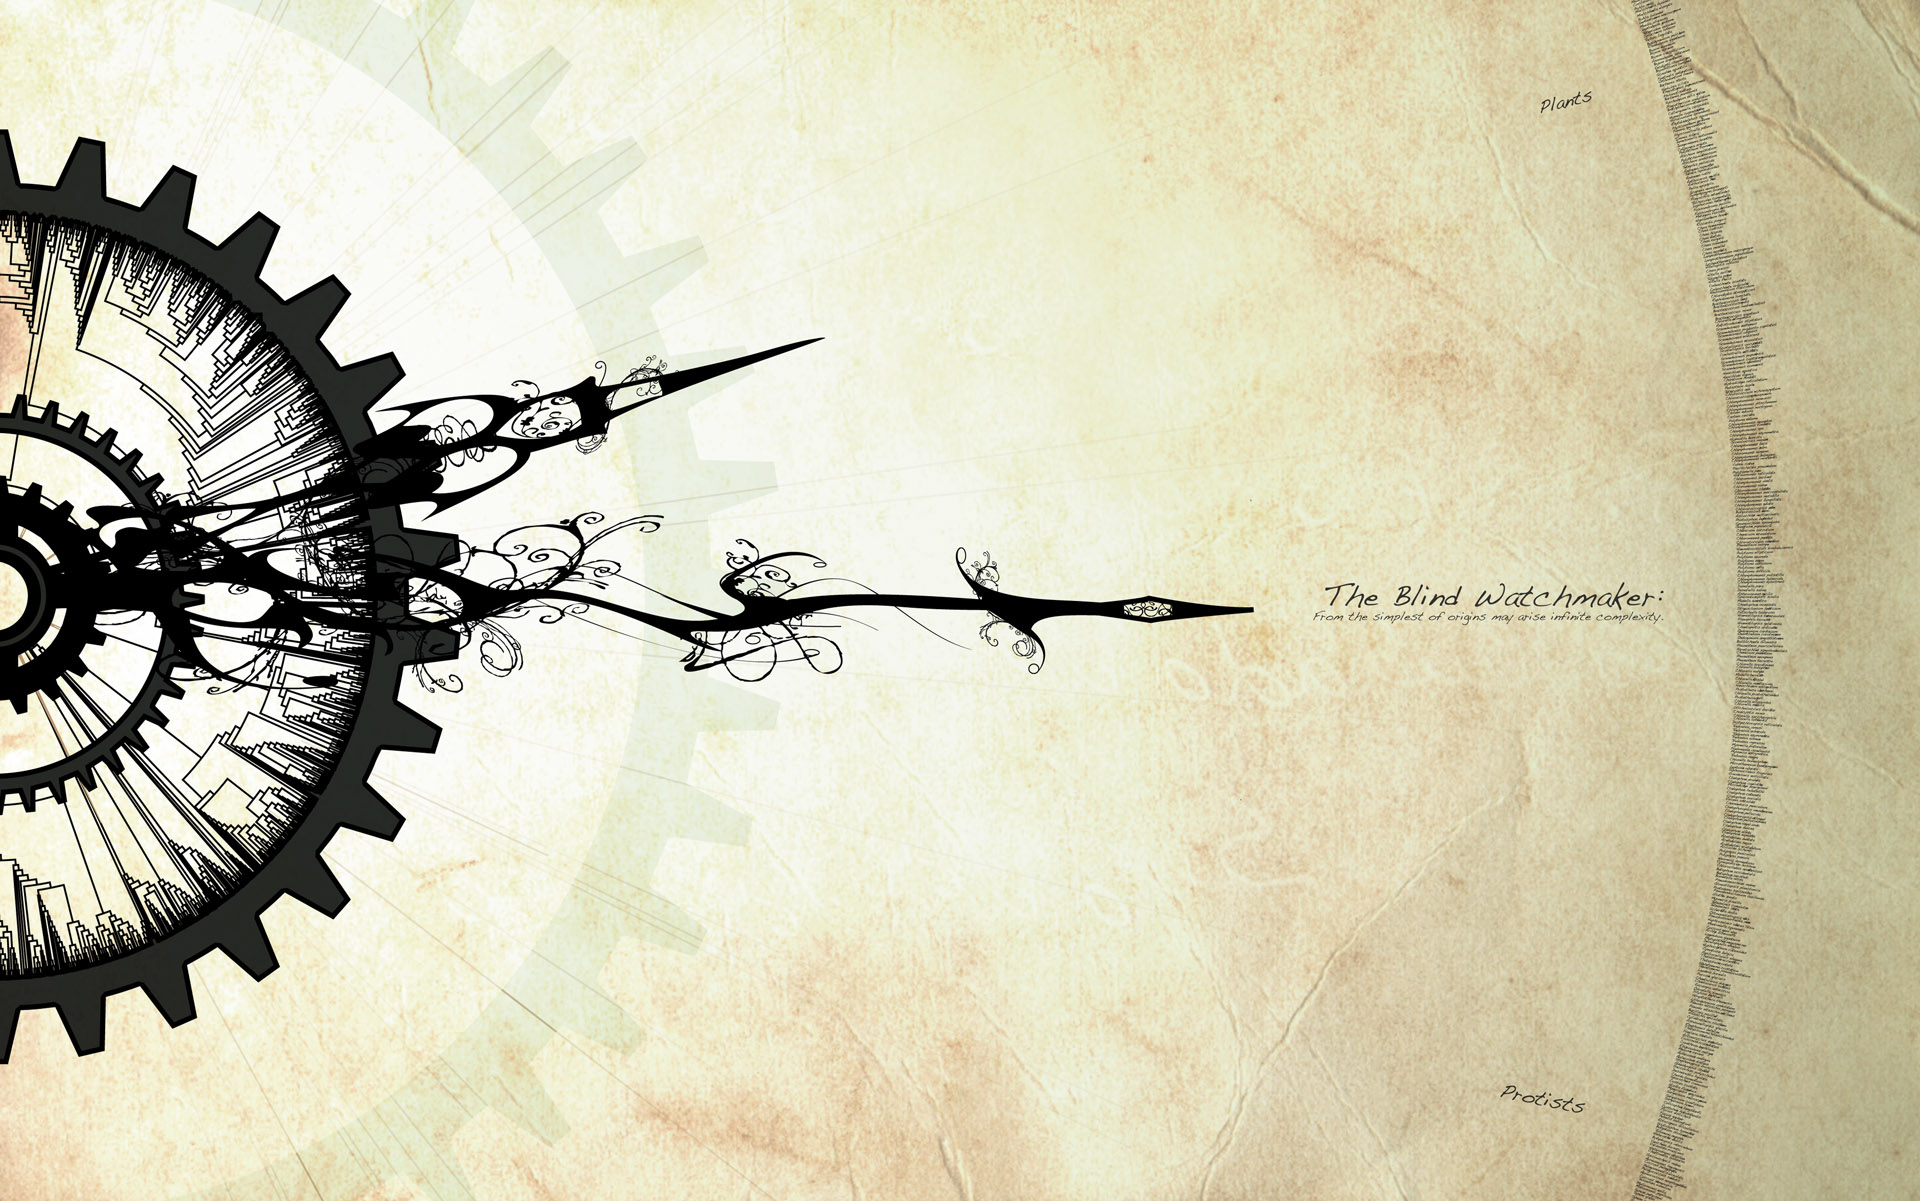 http://fc01.deviantart.net/fs46/f/2009/218/e/d/The_Blind_Watchmaker_by_pyxelated.jpg